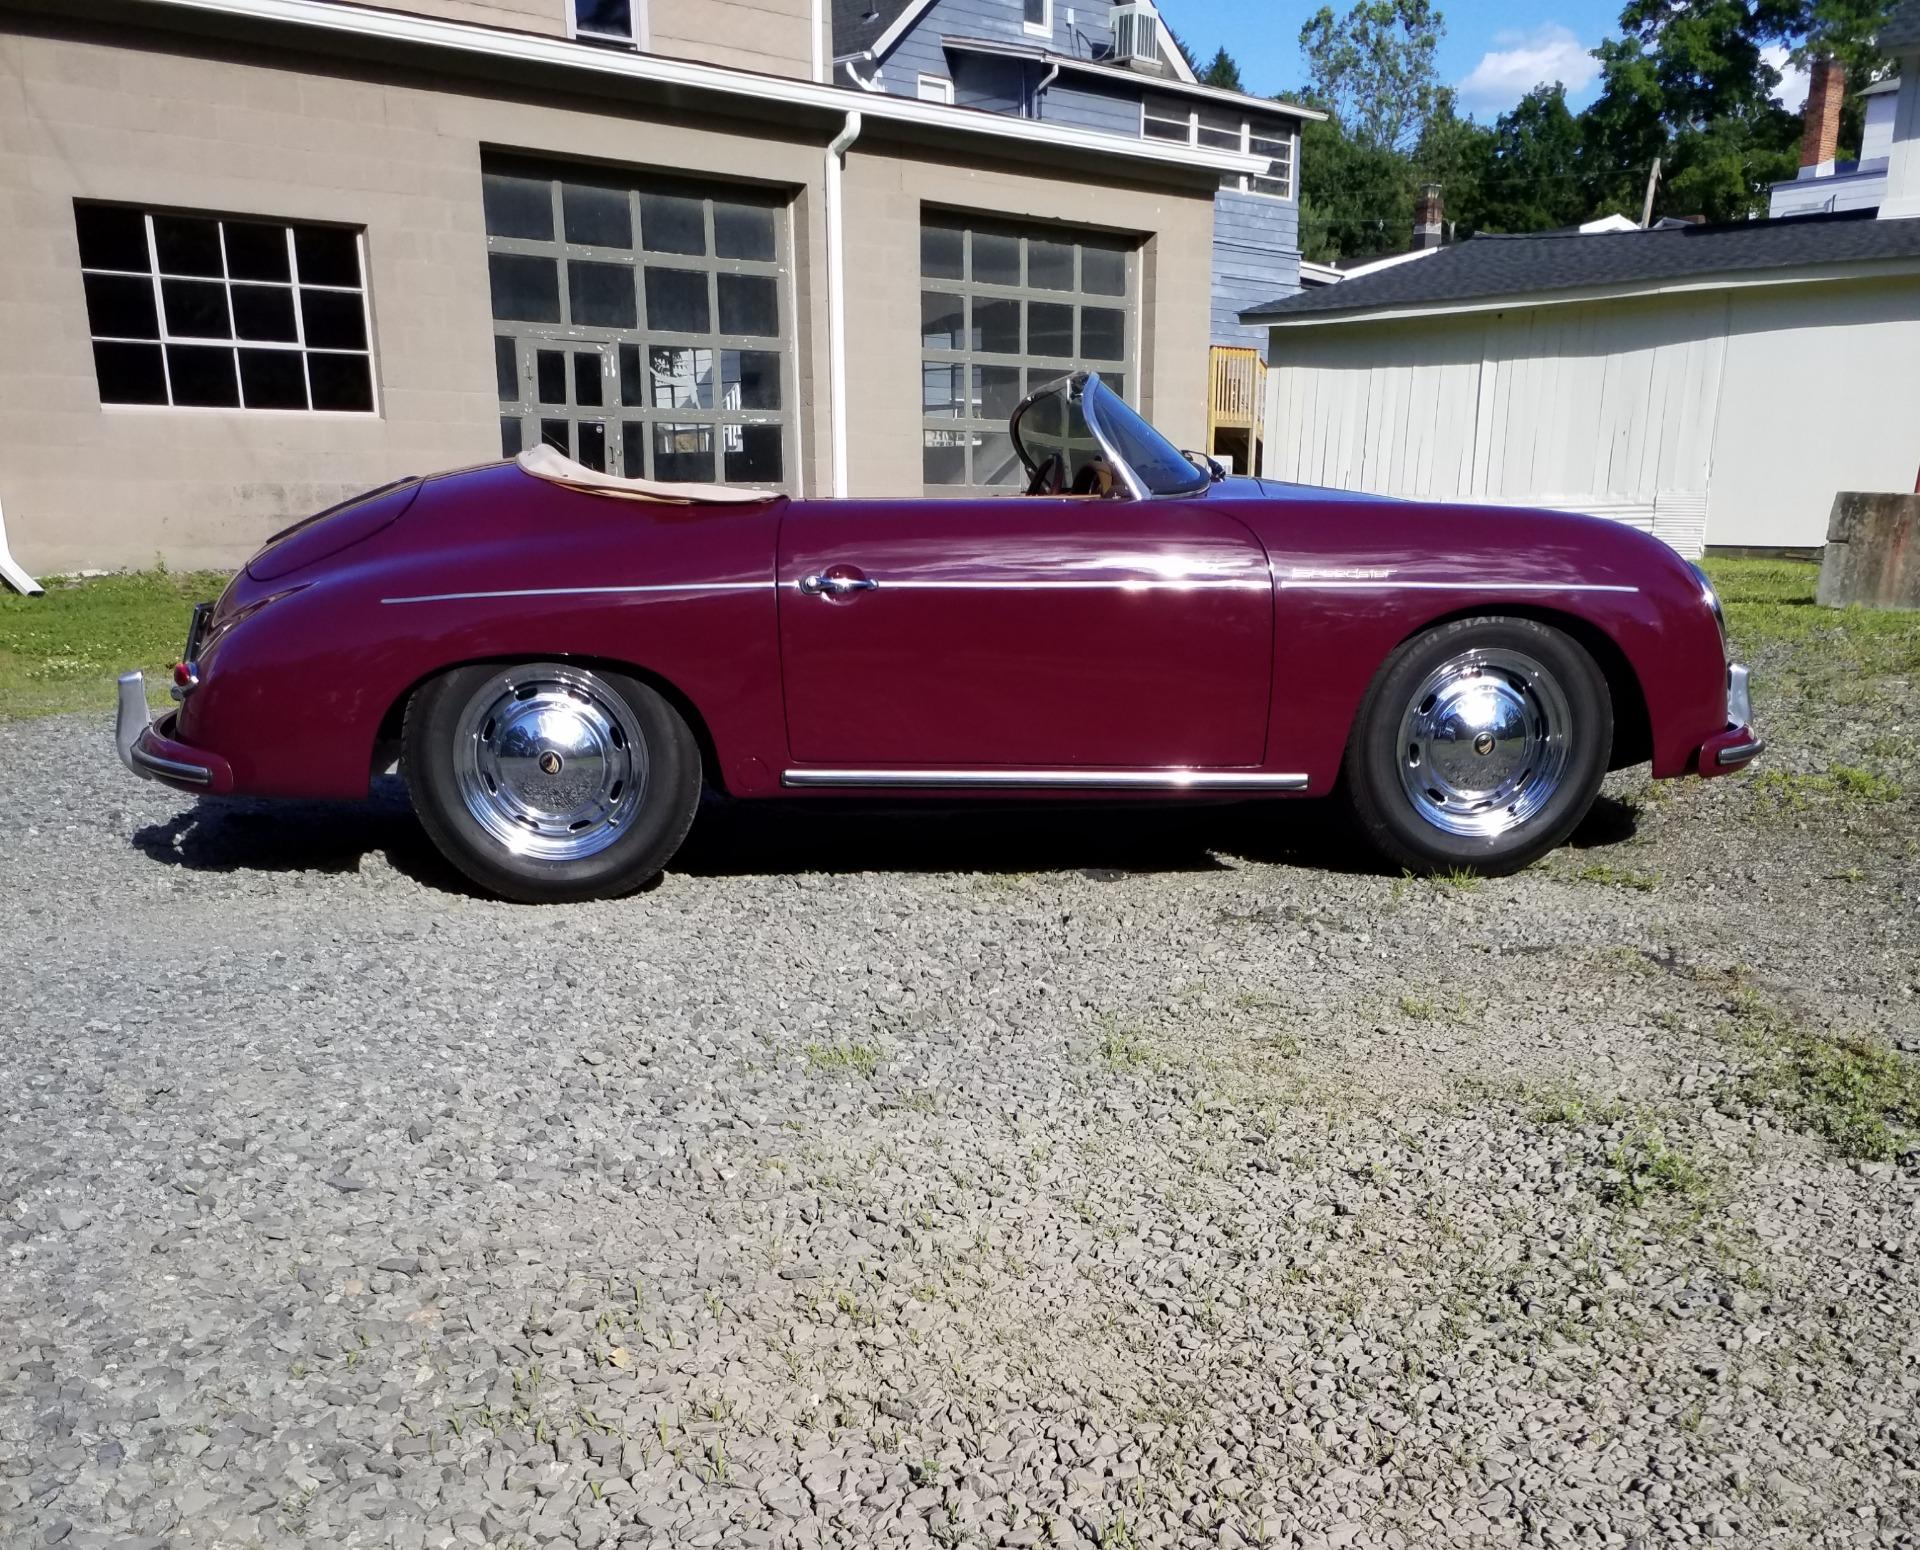 Used-2007-Porsche---Replica-1957-Speedster